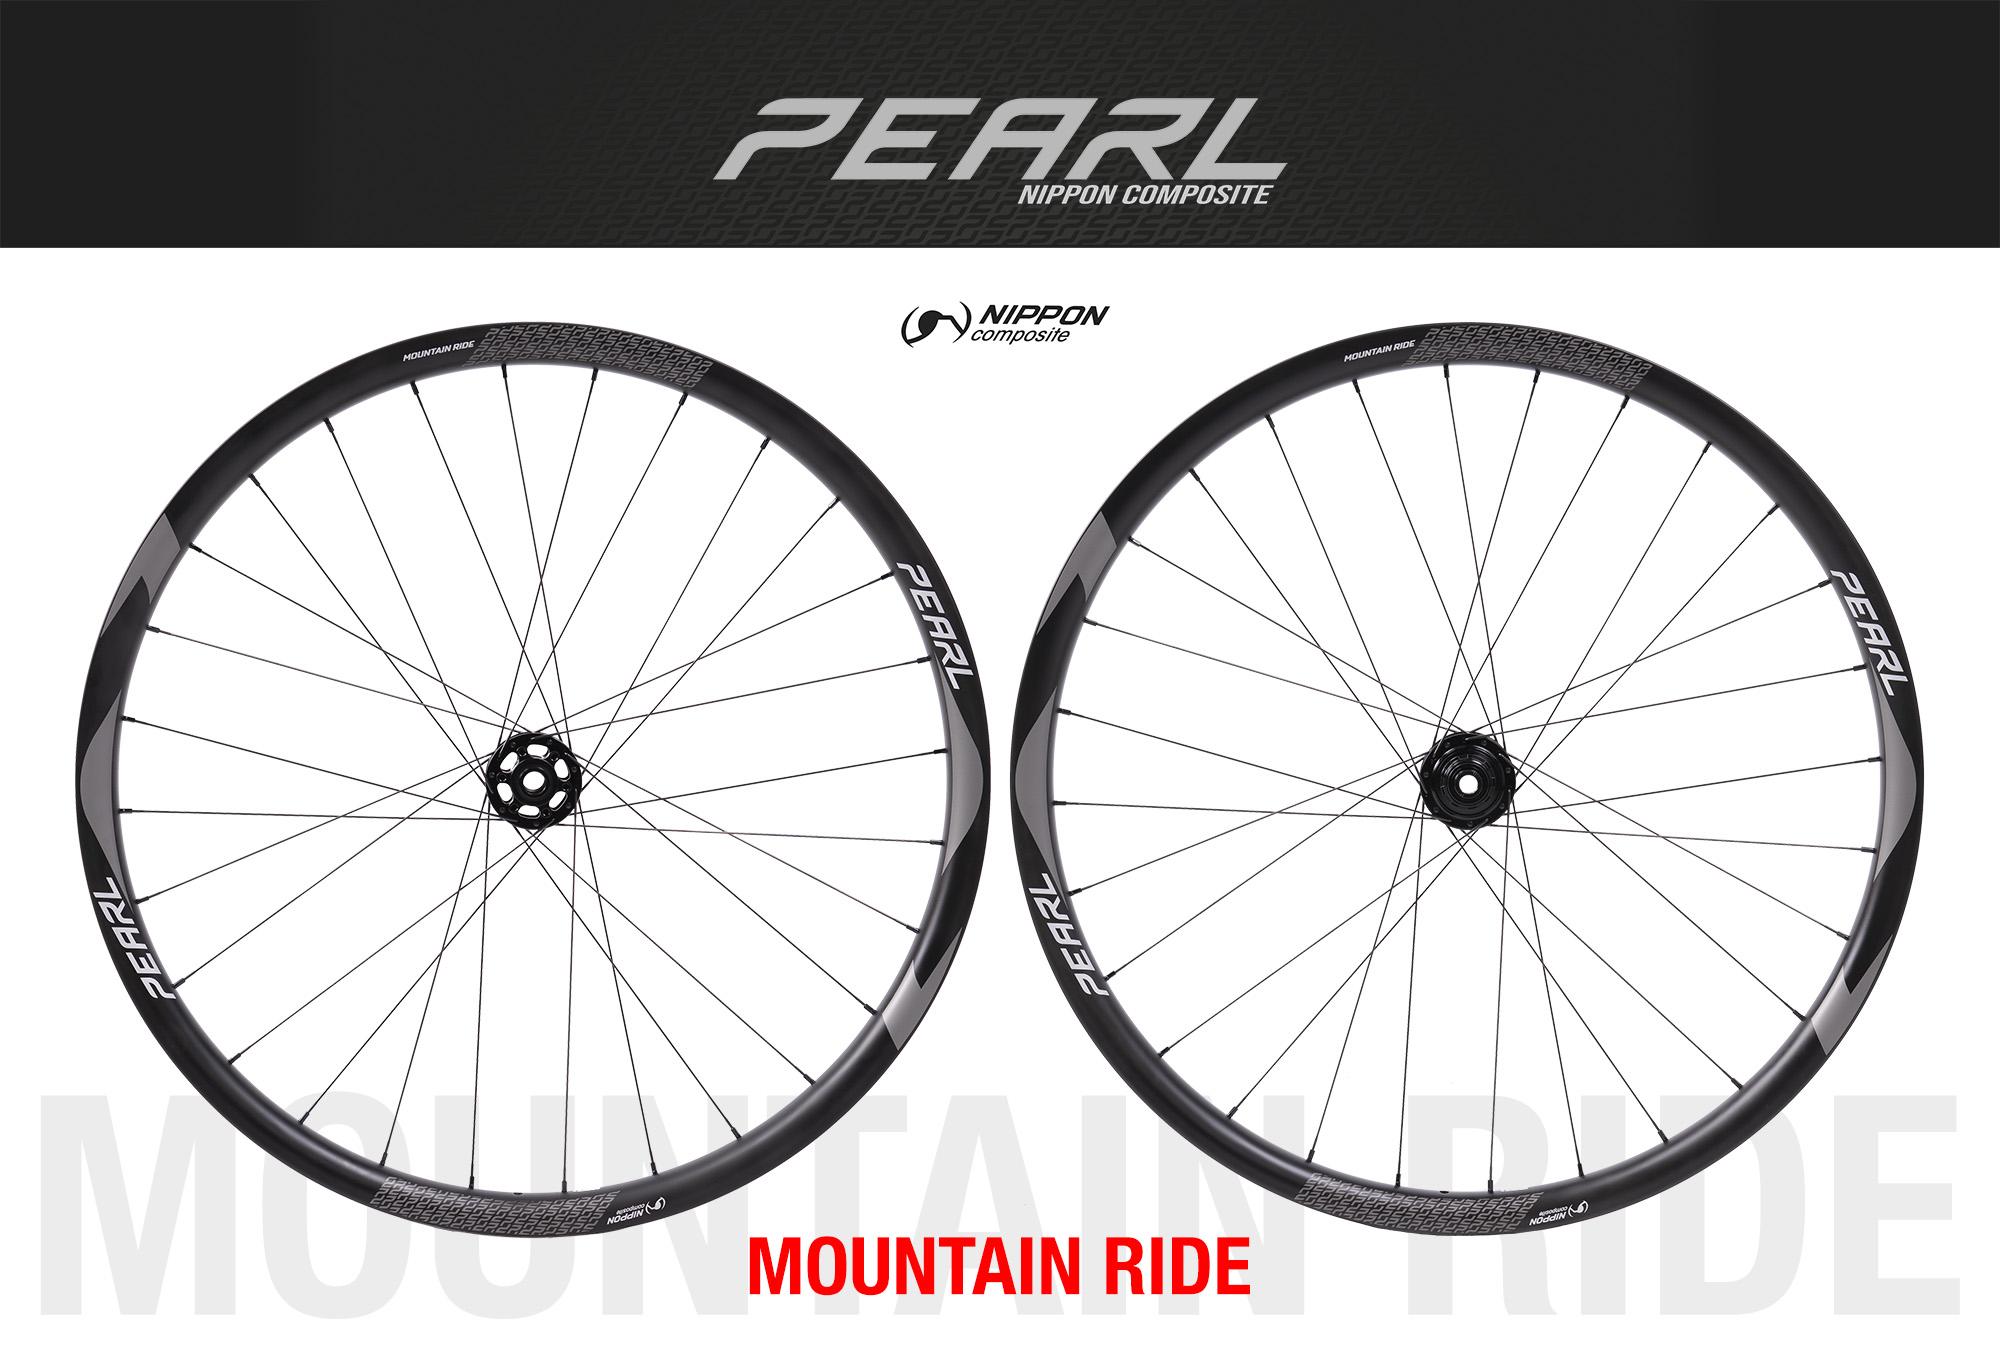 PEARL | MOUNTAIN RIDE 29er Carbon Wheelset (Shimano)